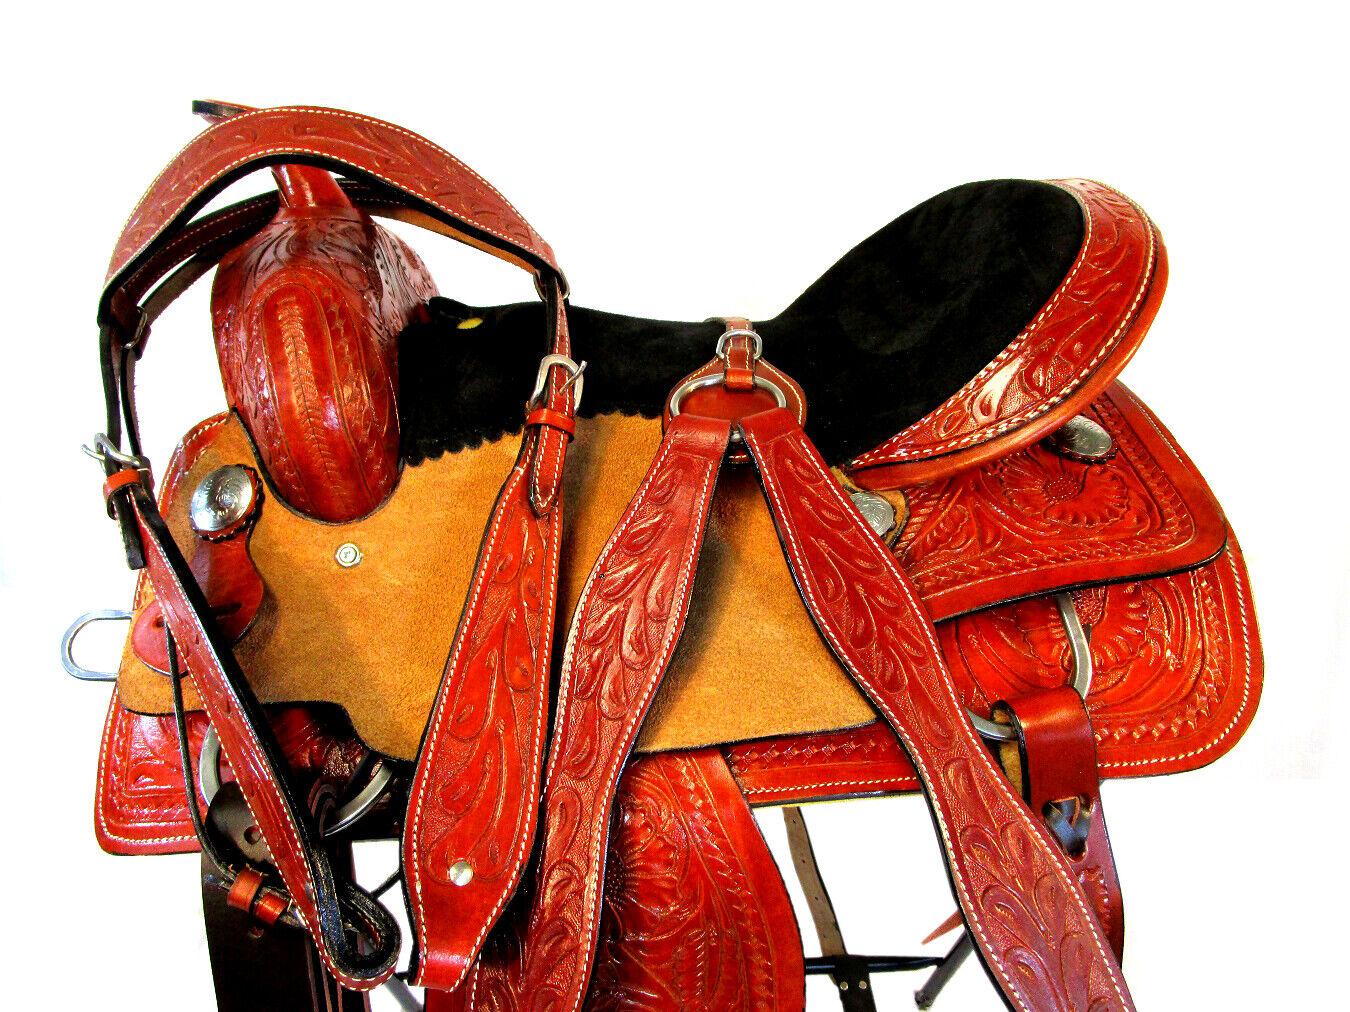 BARREL RACING DEEP SEAT FLORAL TOOLED PLEASURE TRAIL WESTERN